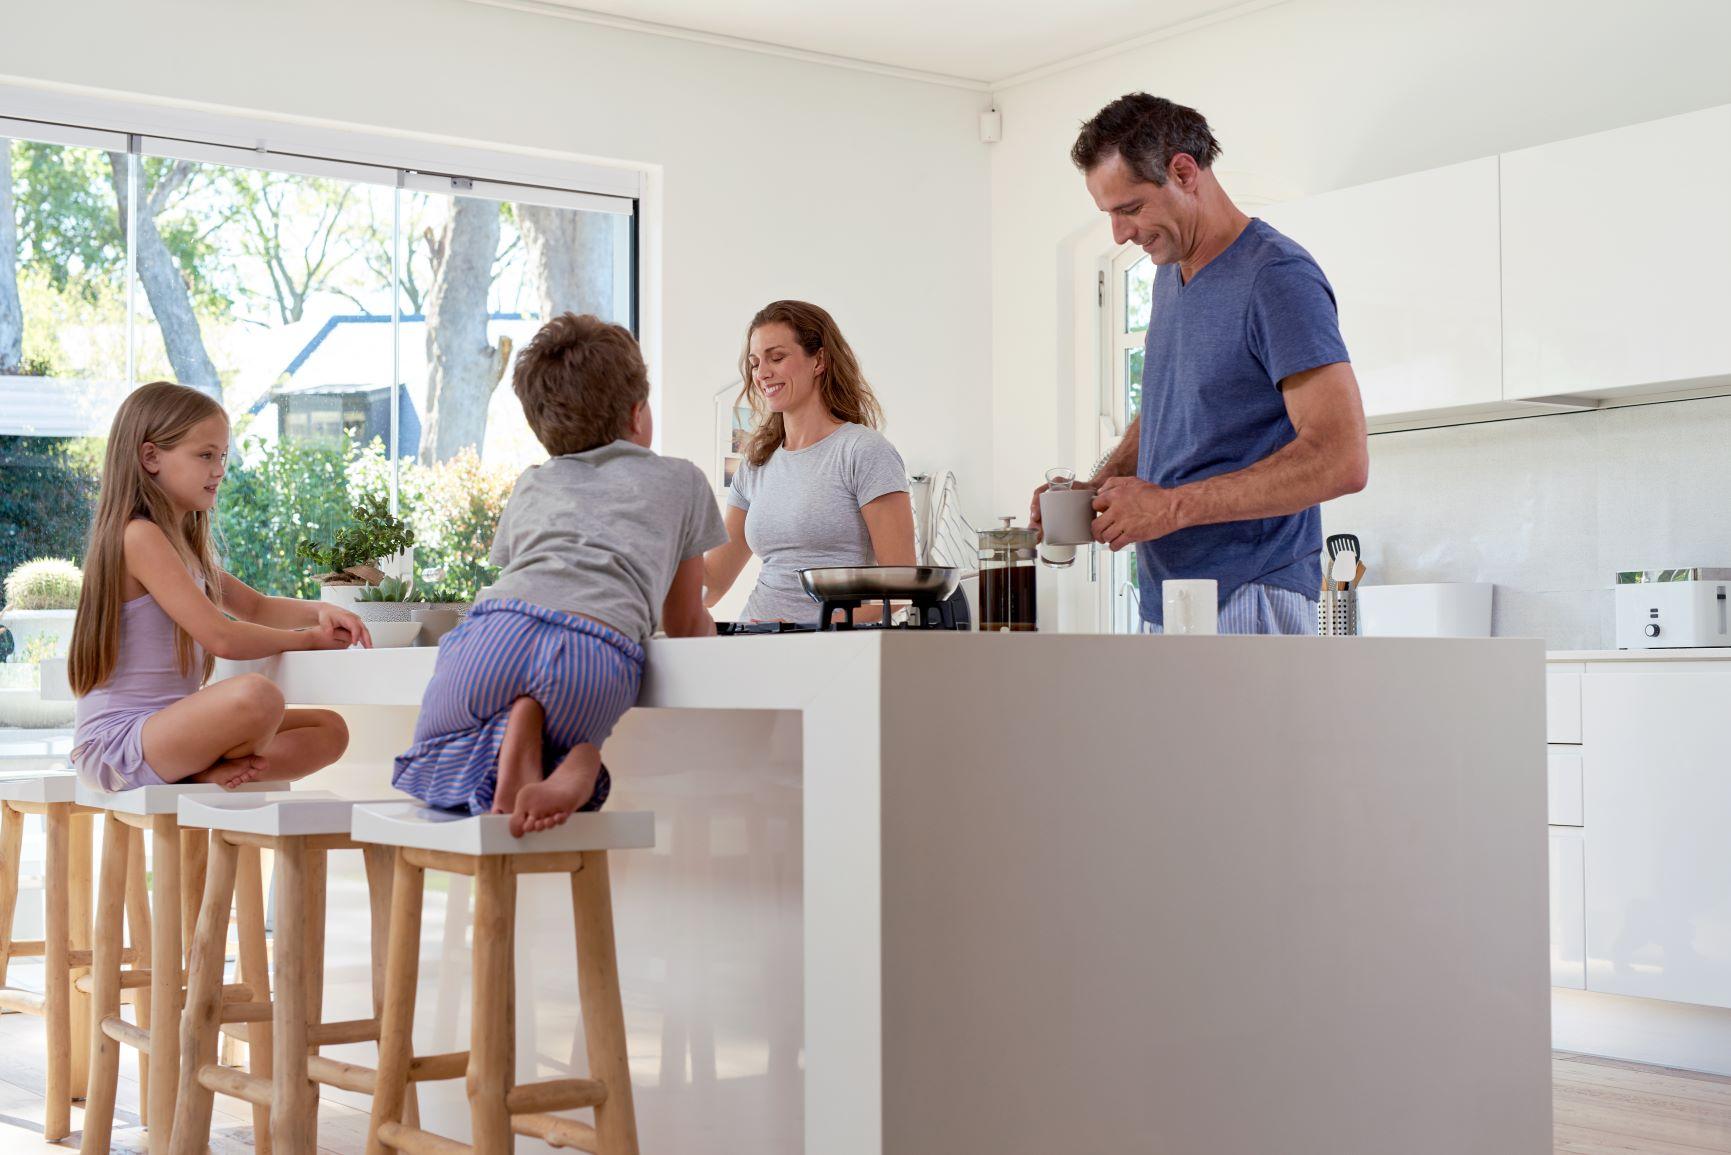 Image of Espacio para cuidar de la salud 4 in Cosentino Releases The 2019 Global Kitchen Study - Cosentino